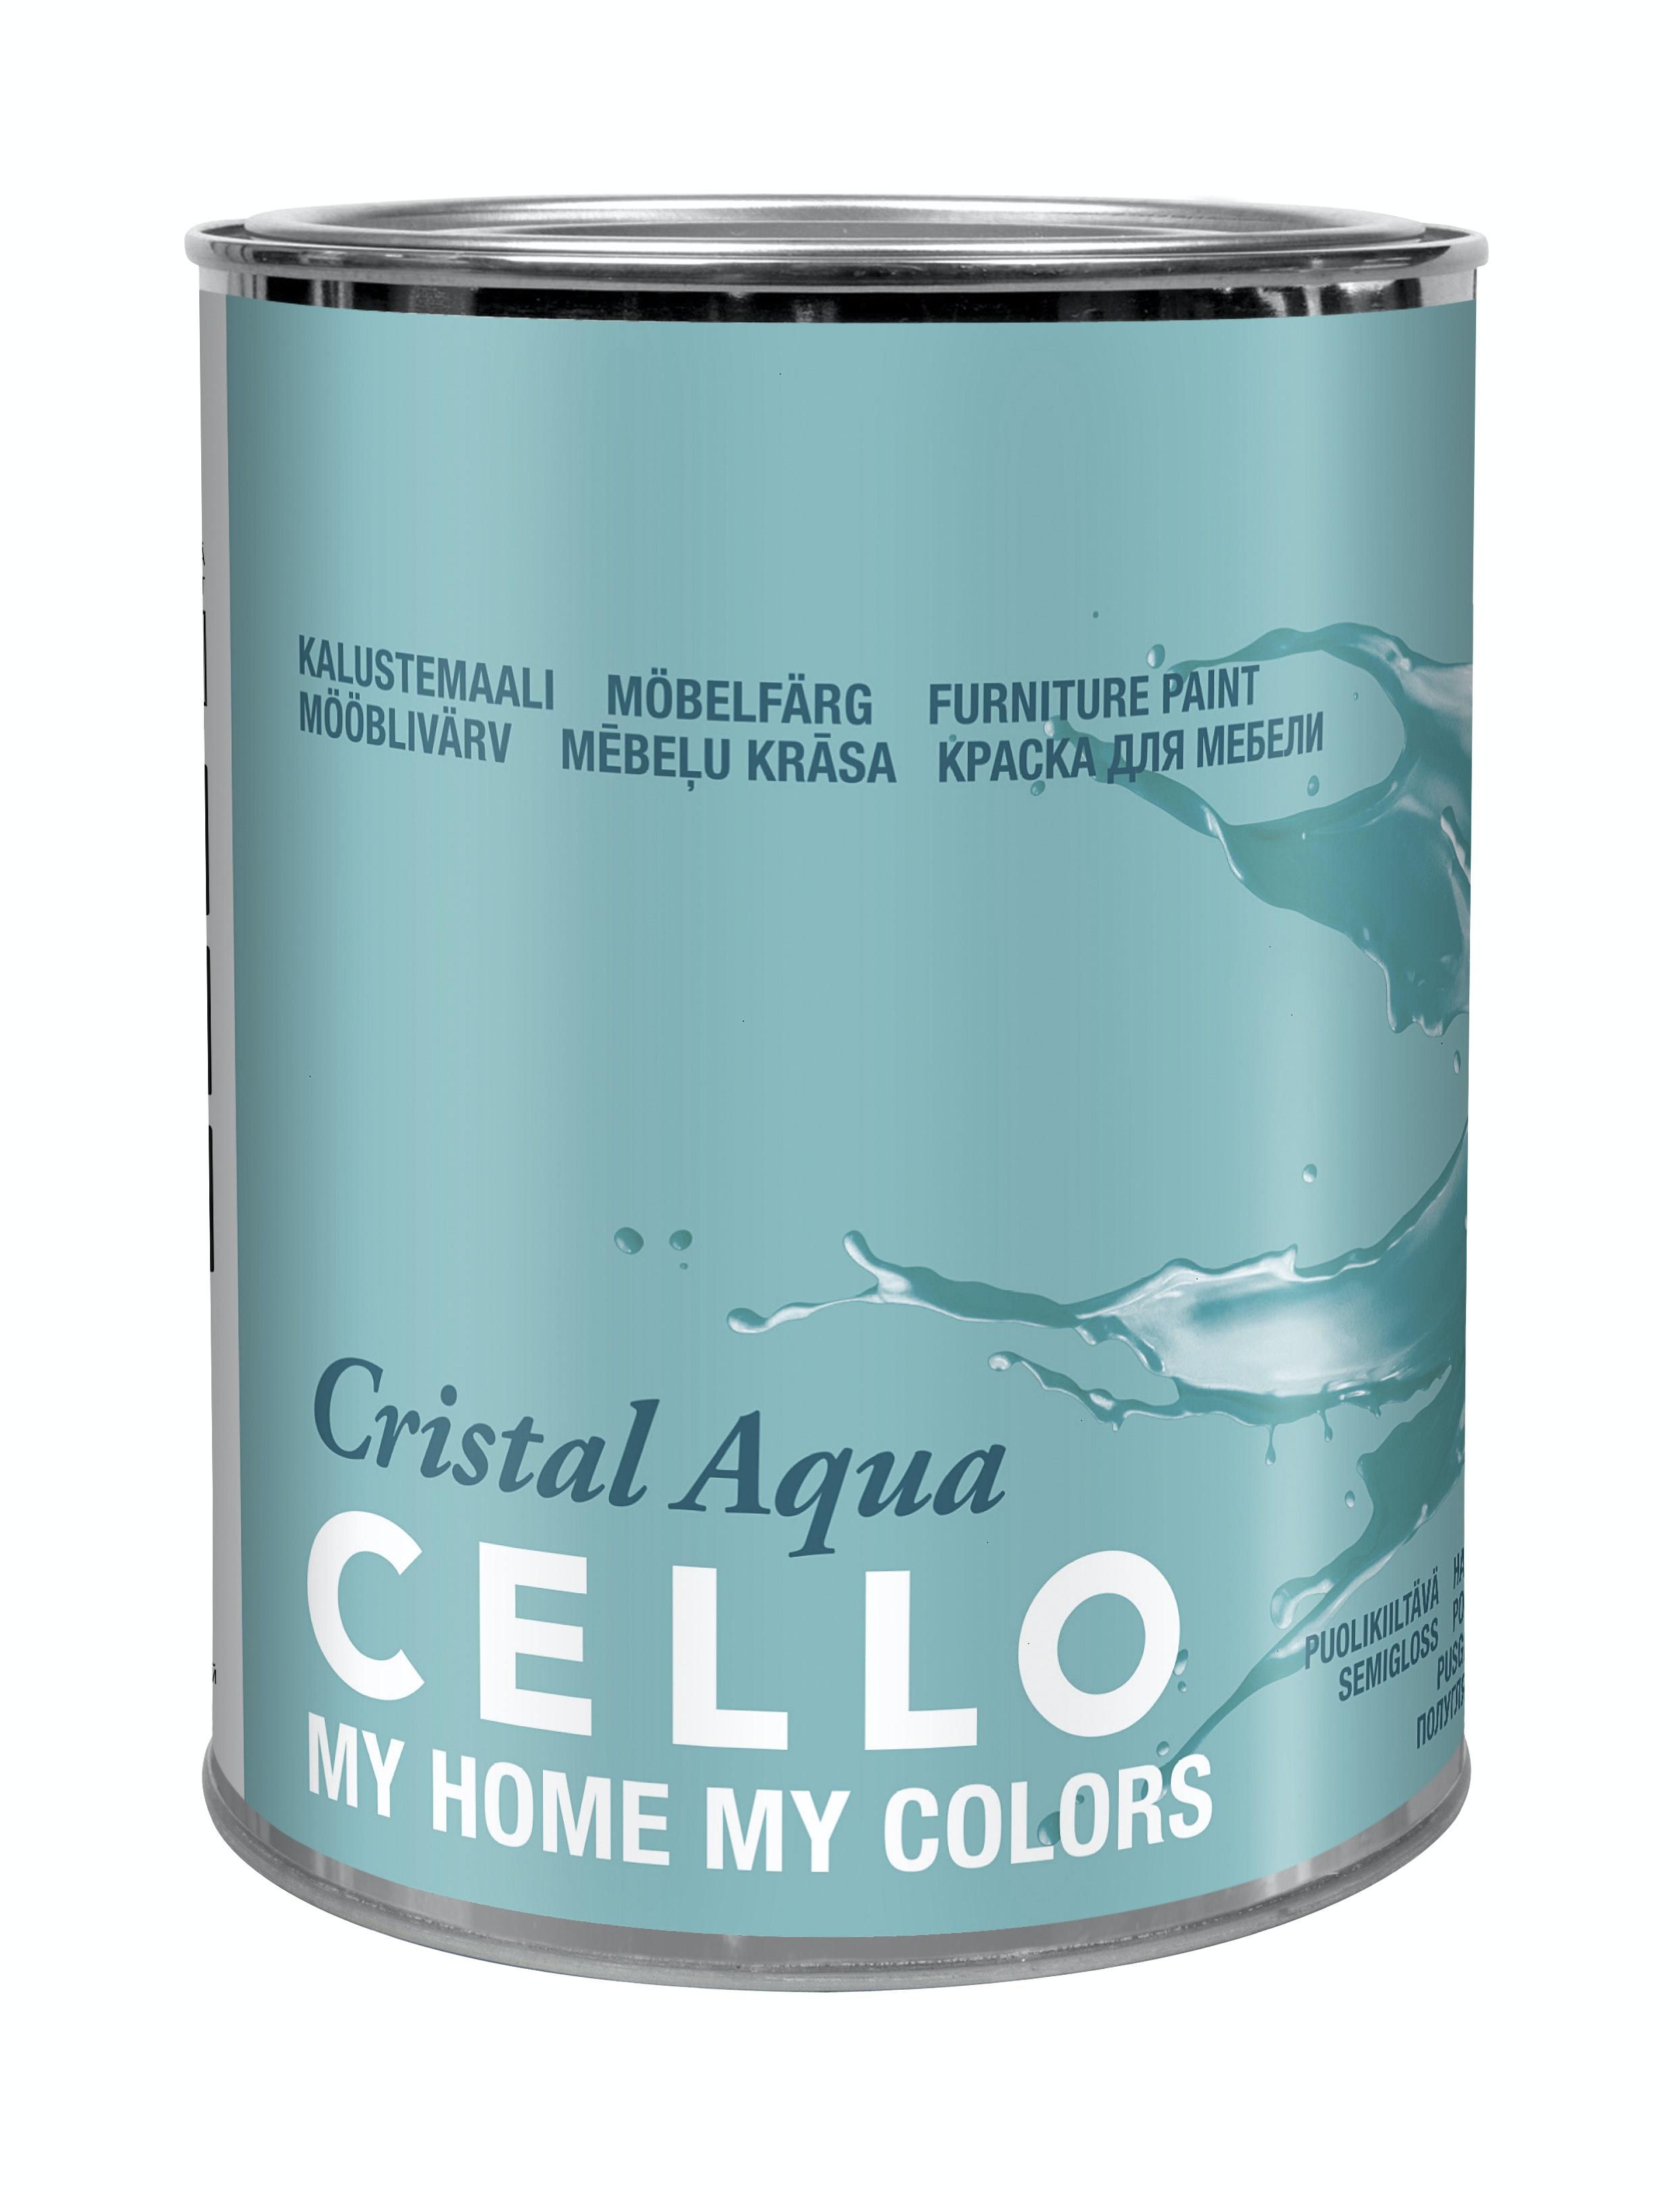 Snickerifärg Cello Cristal Aqua Halvblank Bas 3 0,9l